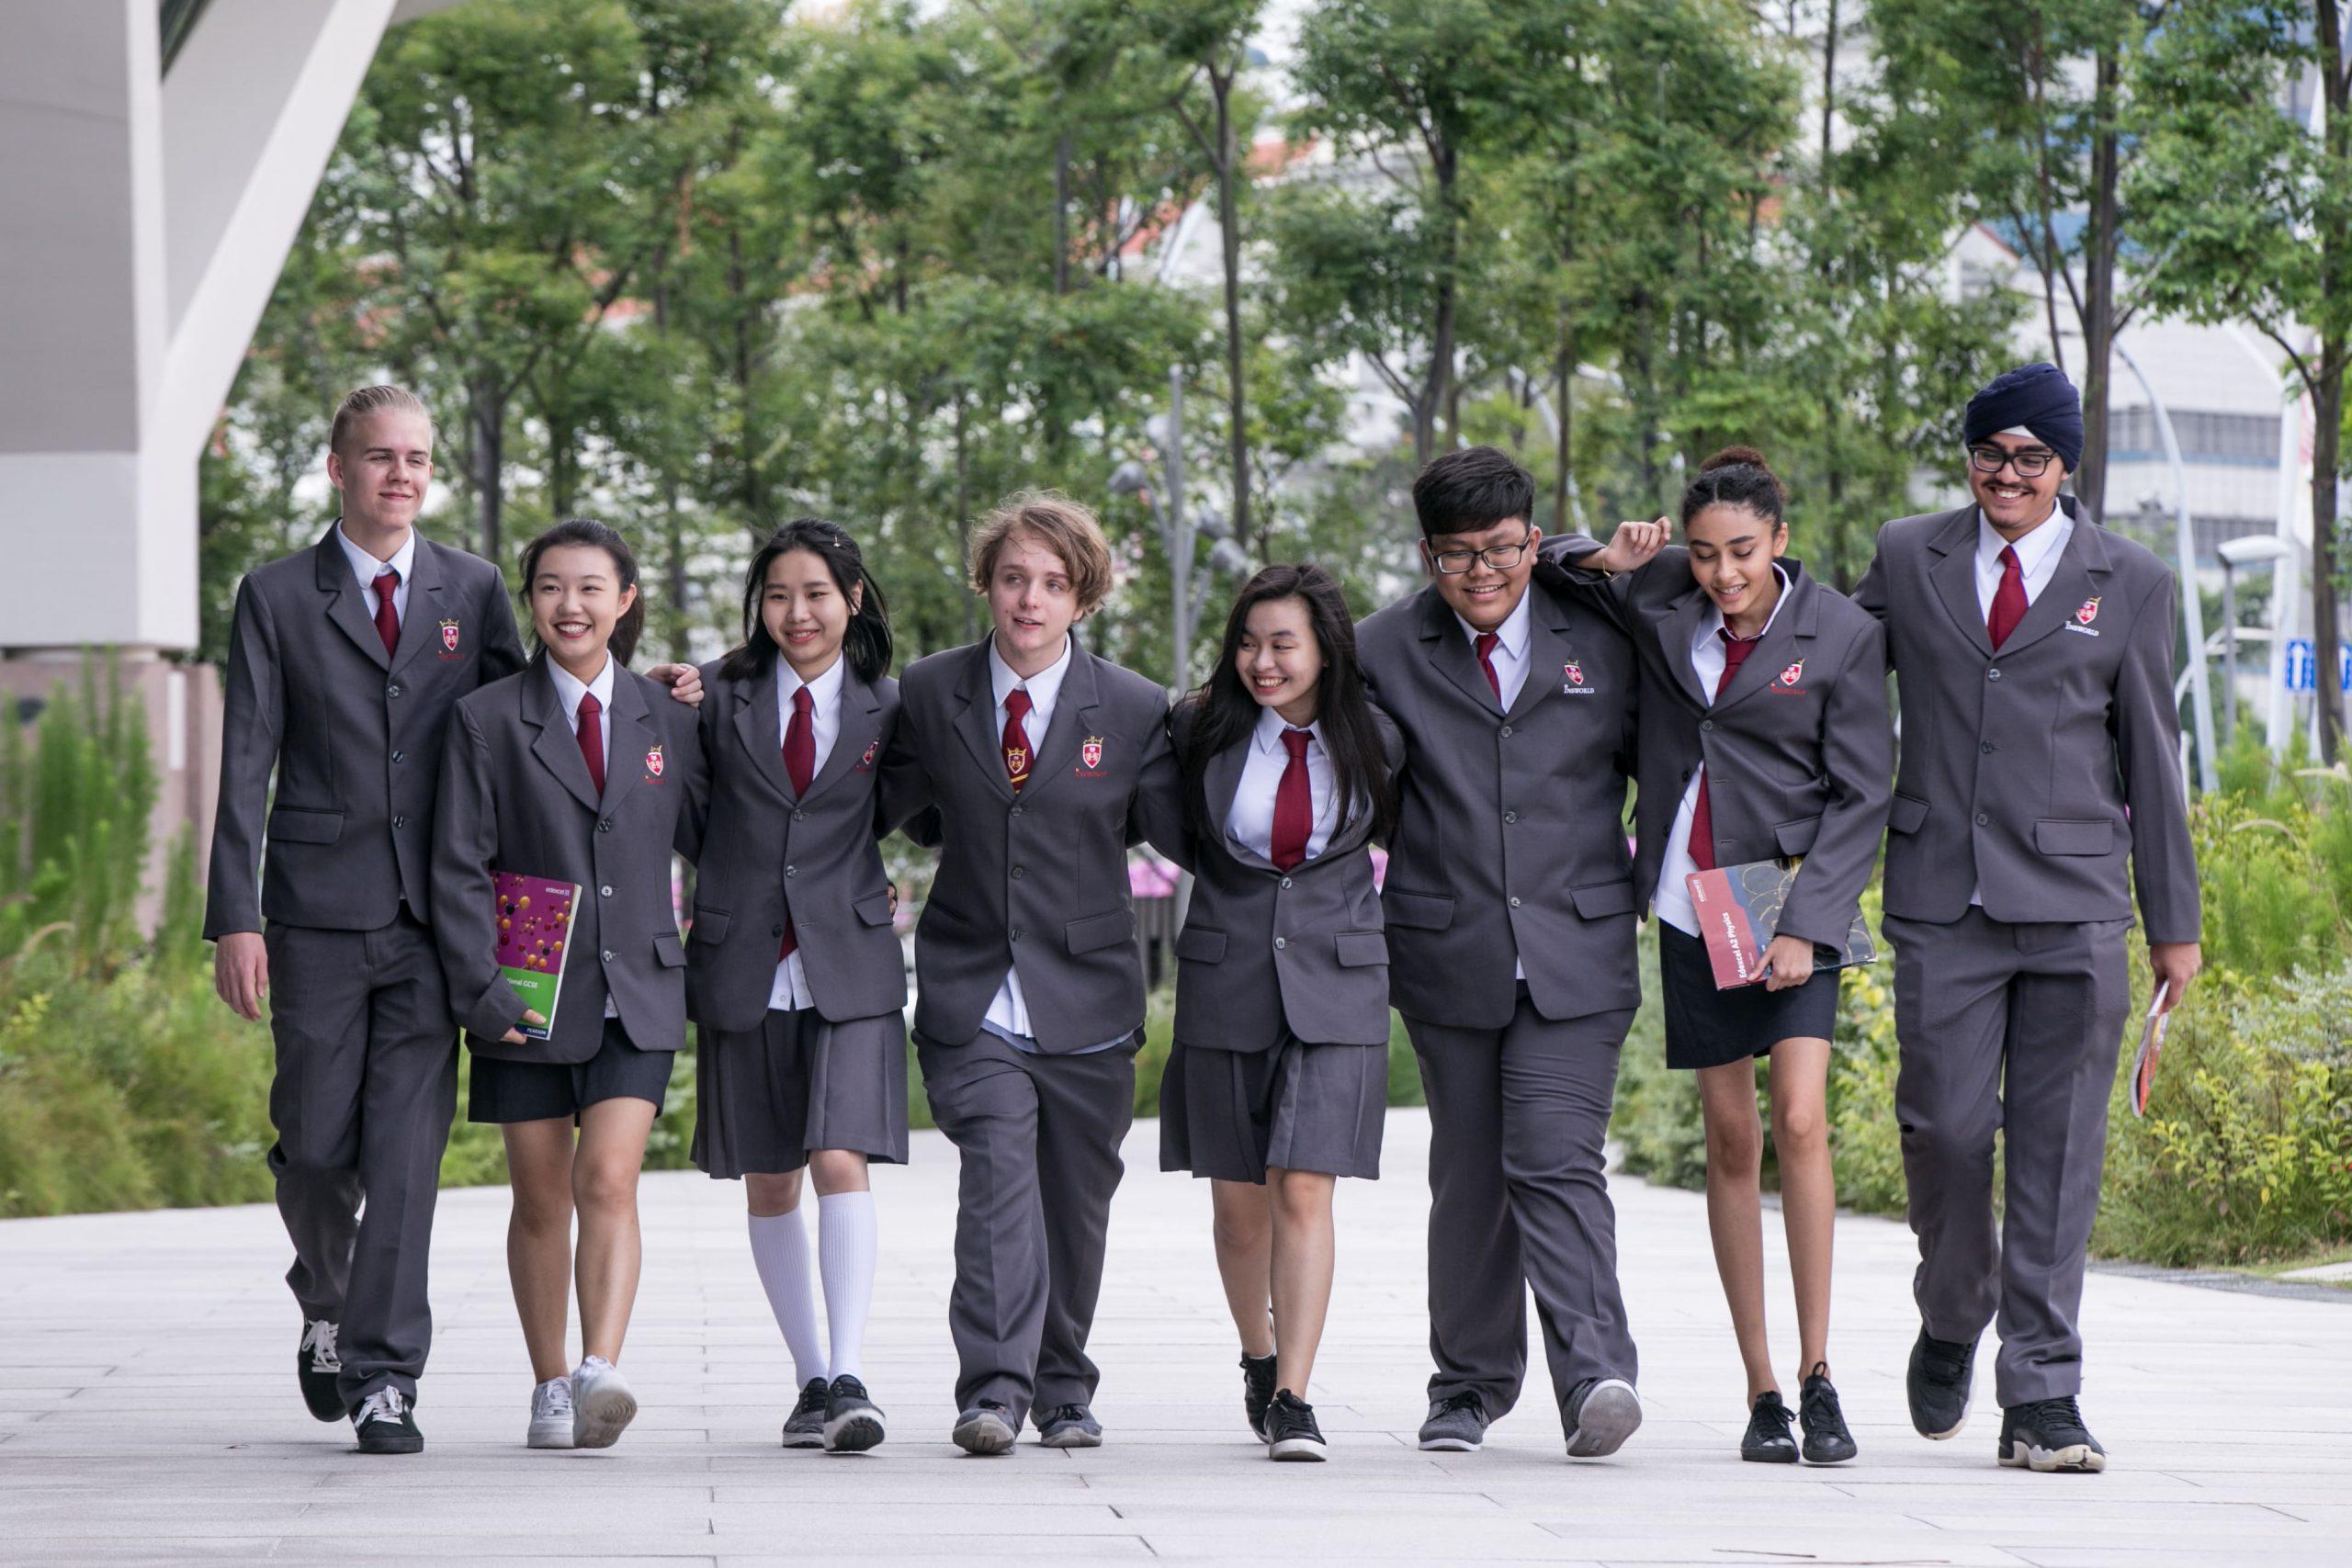 10 Best International Schools in Singapore 2020